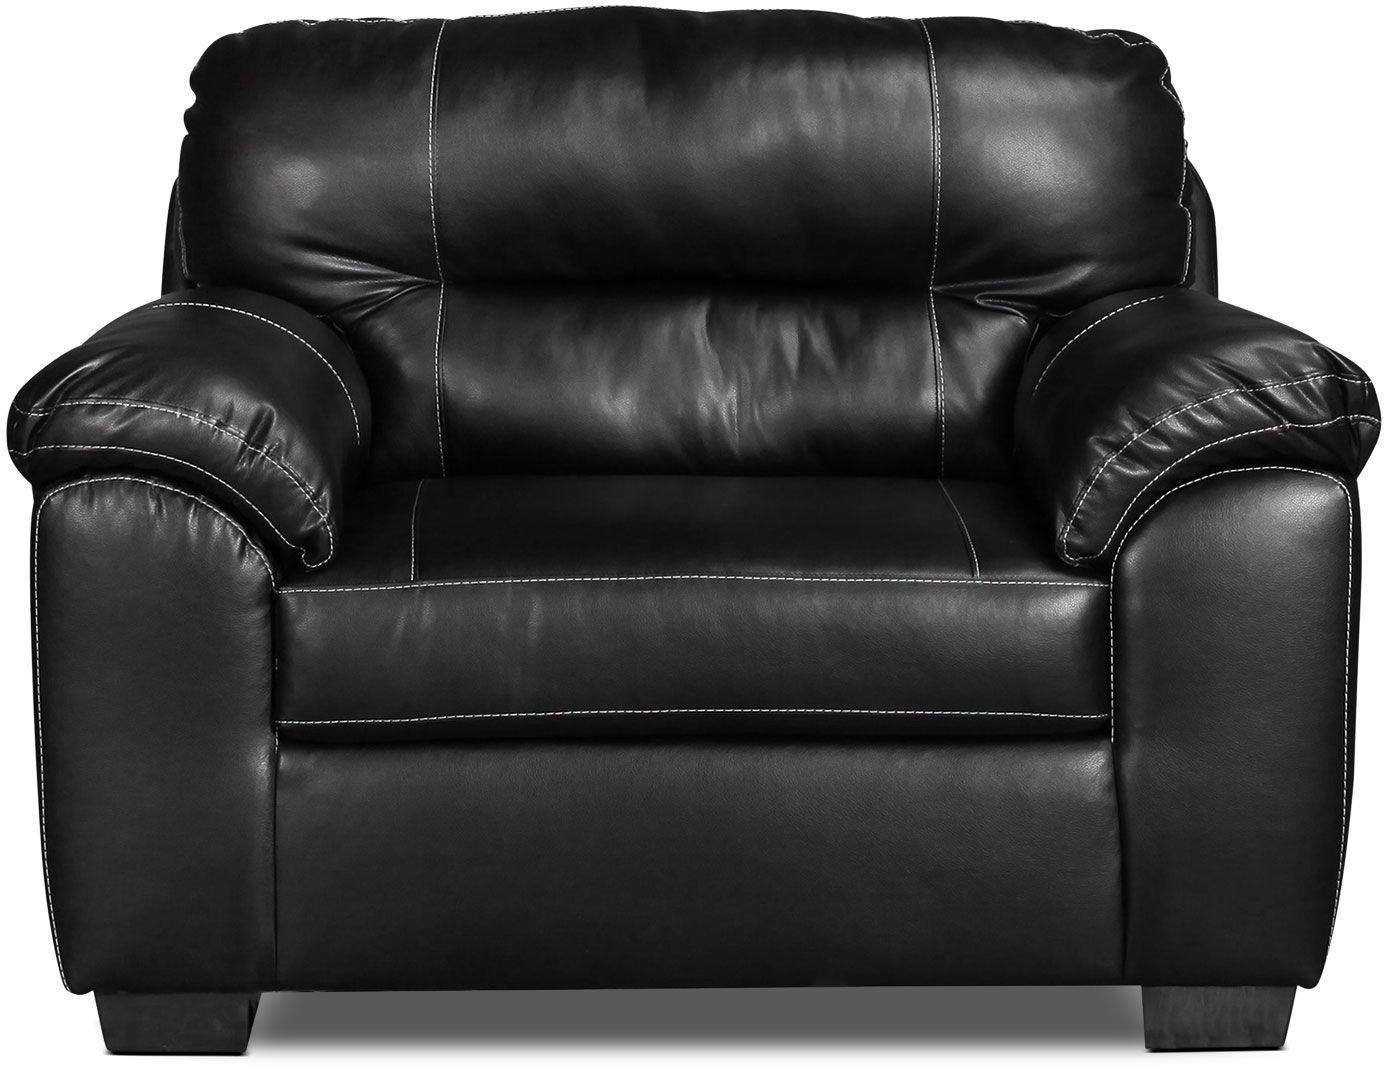 Rigley Chair - Black